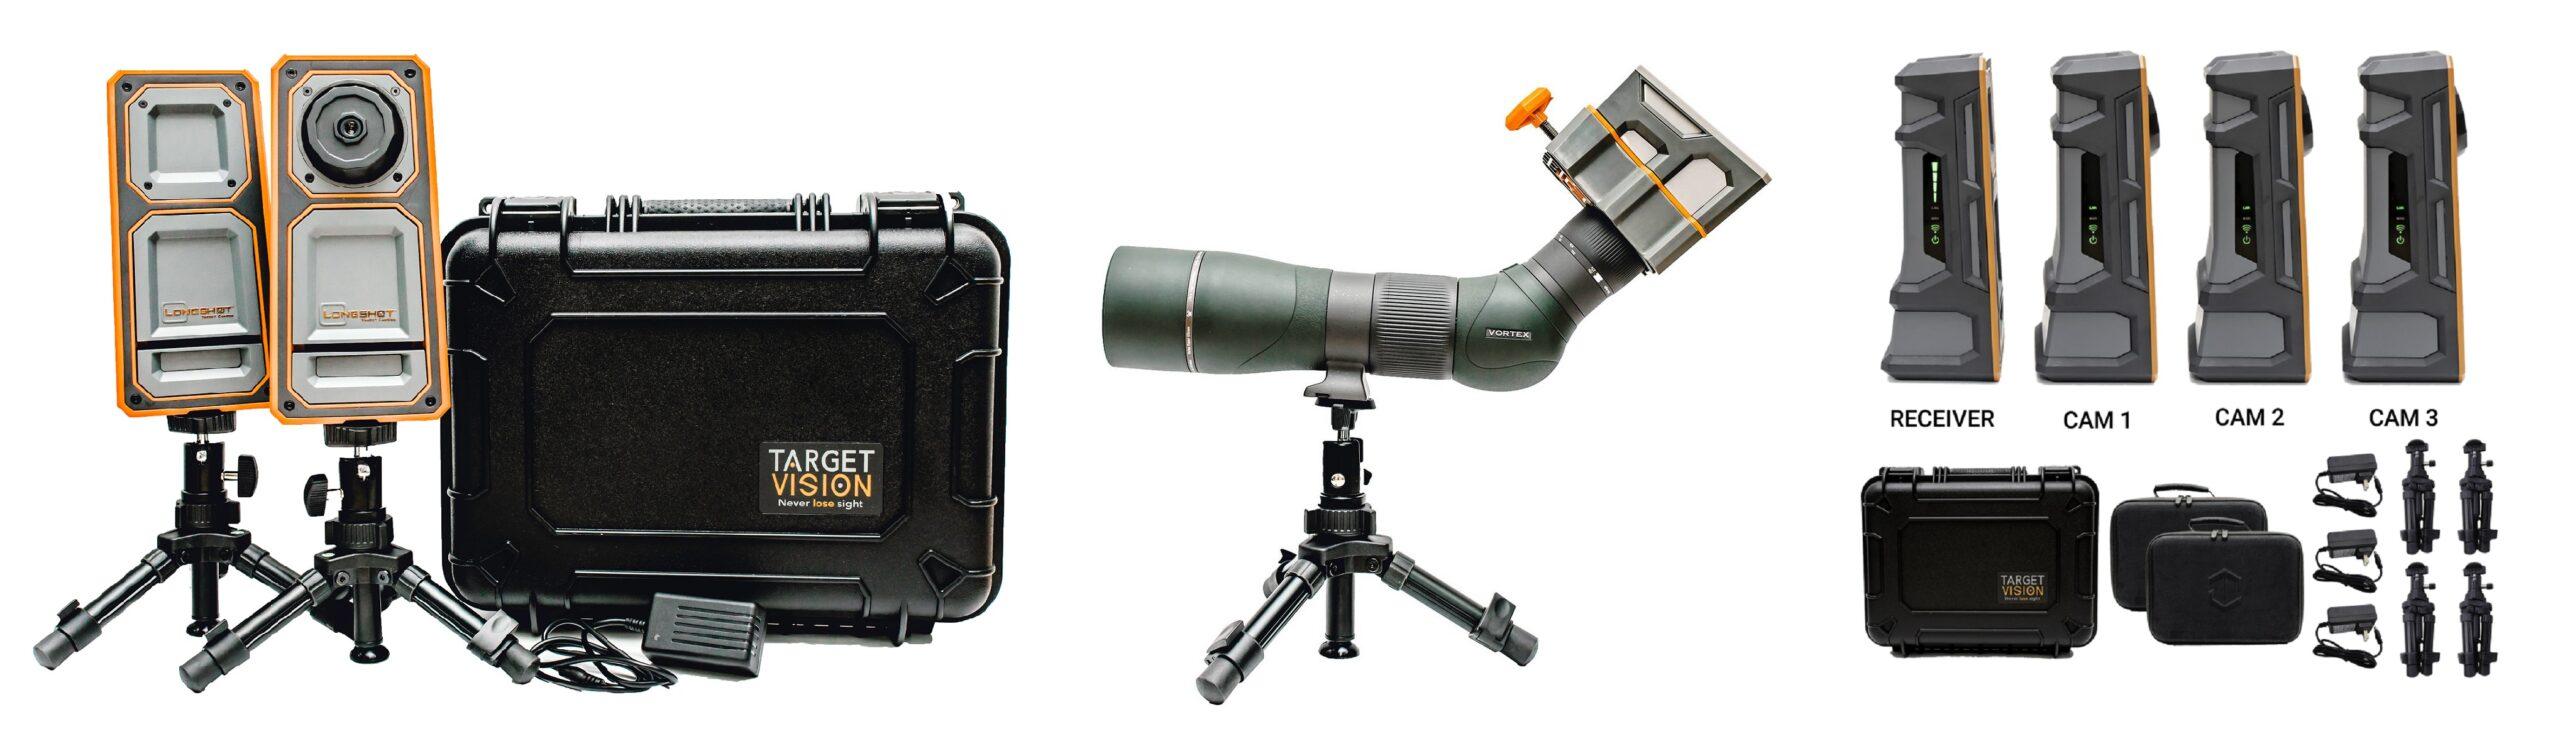 Камеры целевые LONGSHOT